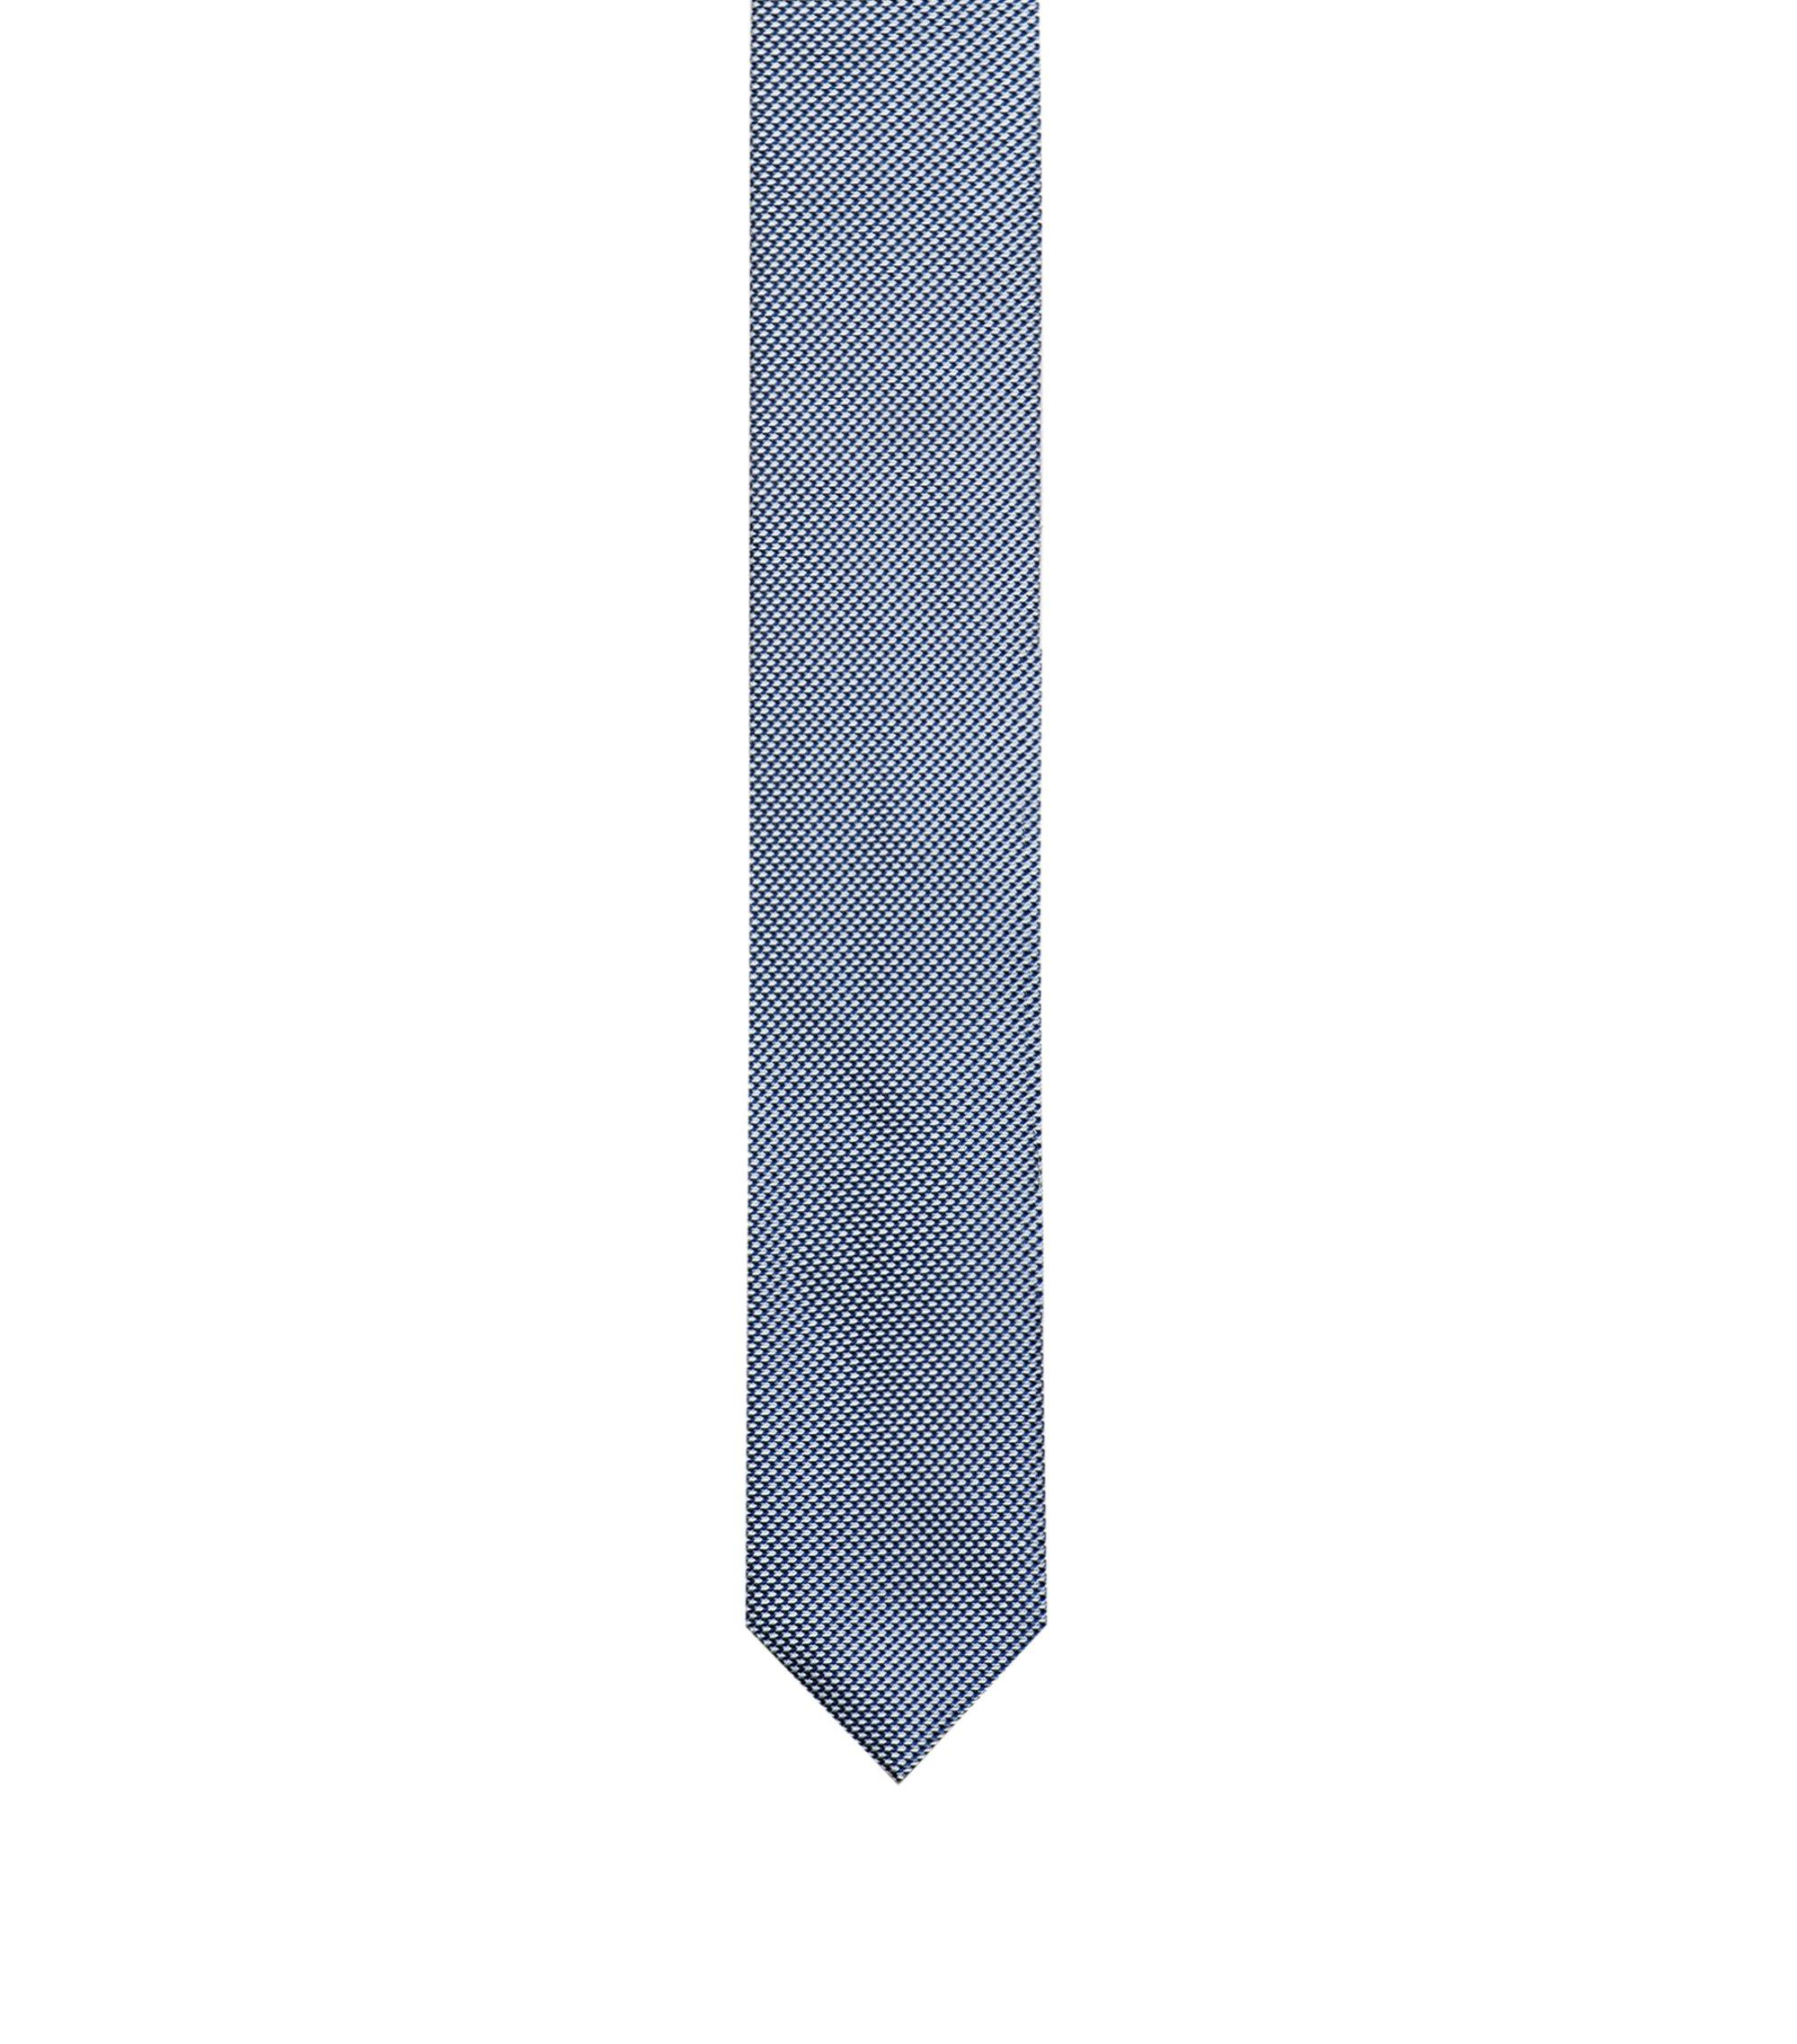 Krawatte aus Seiden-Jacquard, Dunkelblau